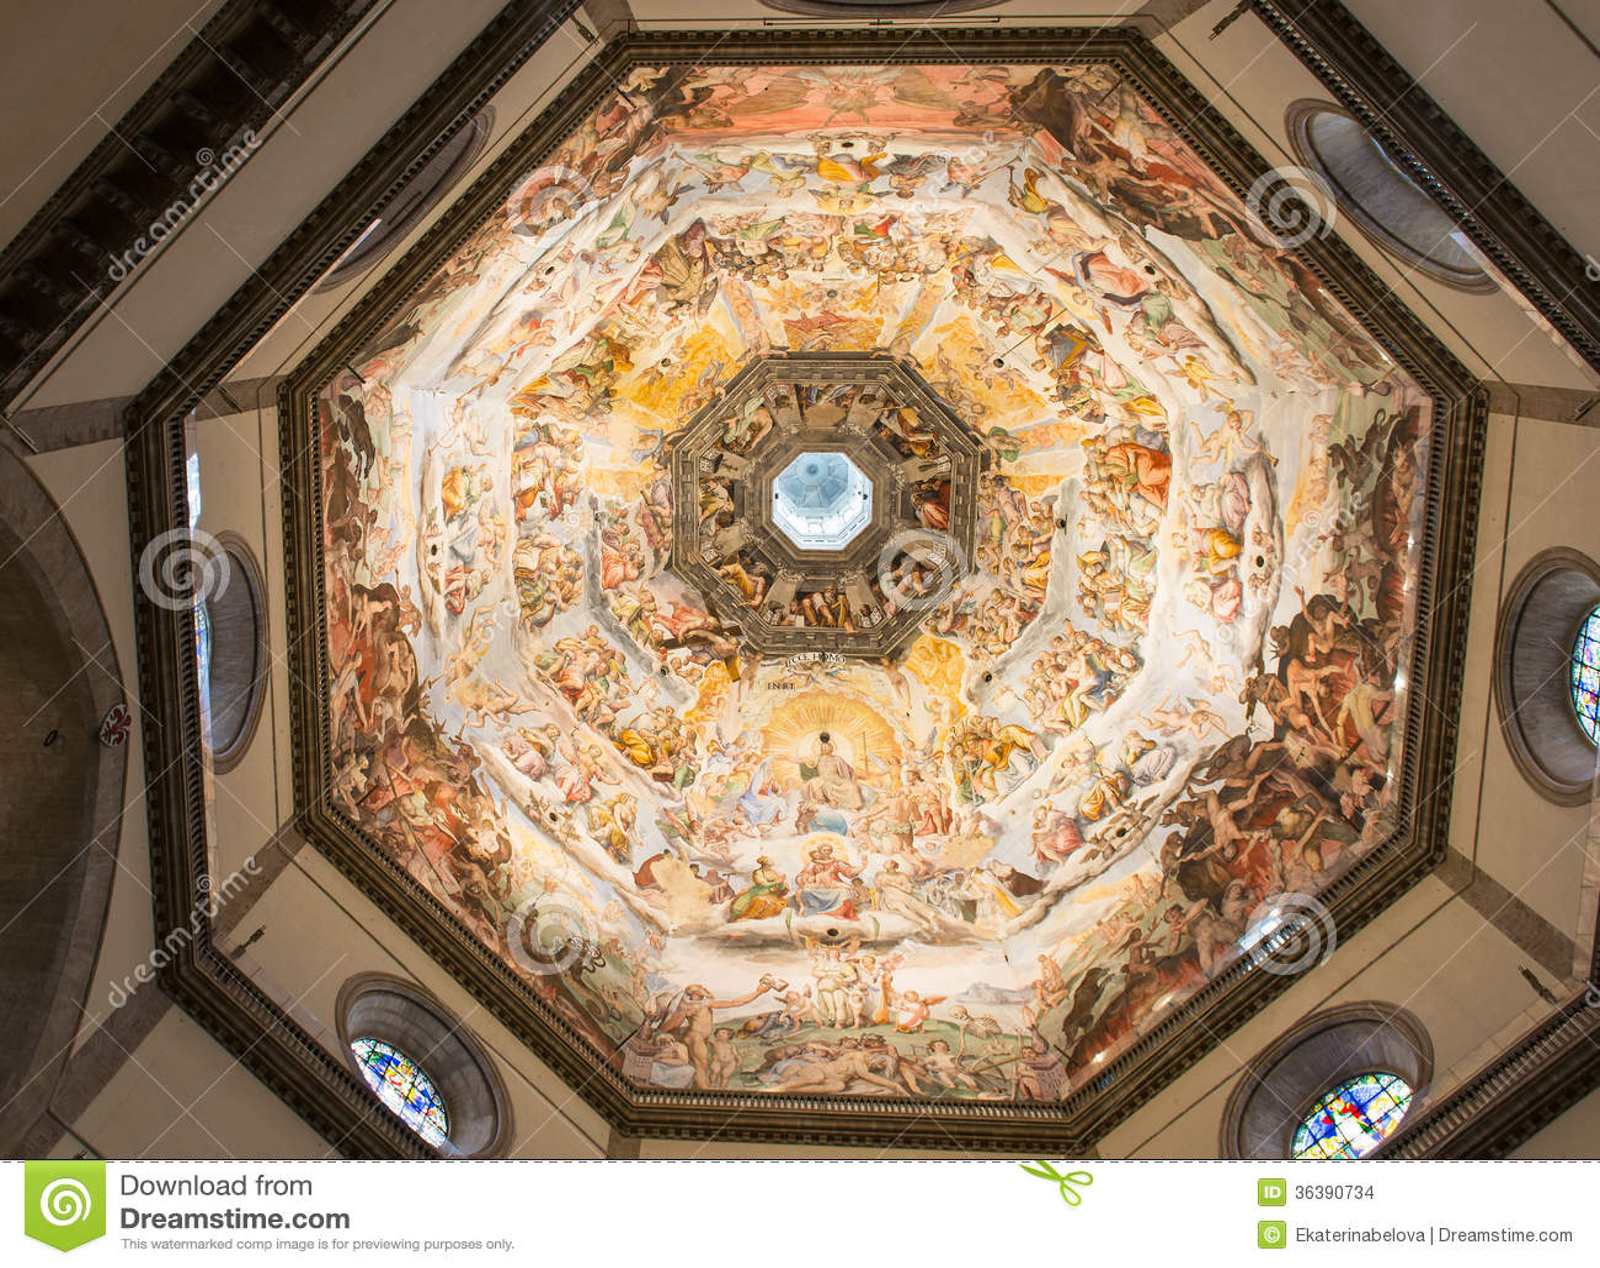 Interior View Of The Painting Of Dome Basilica Di Santa